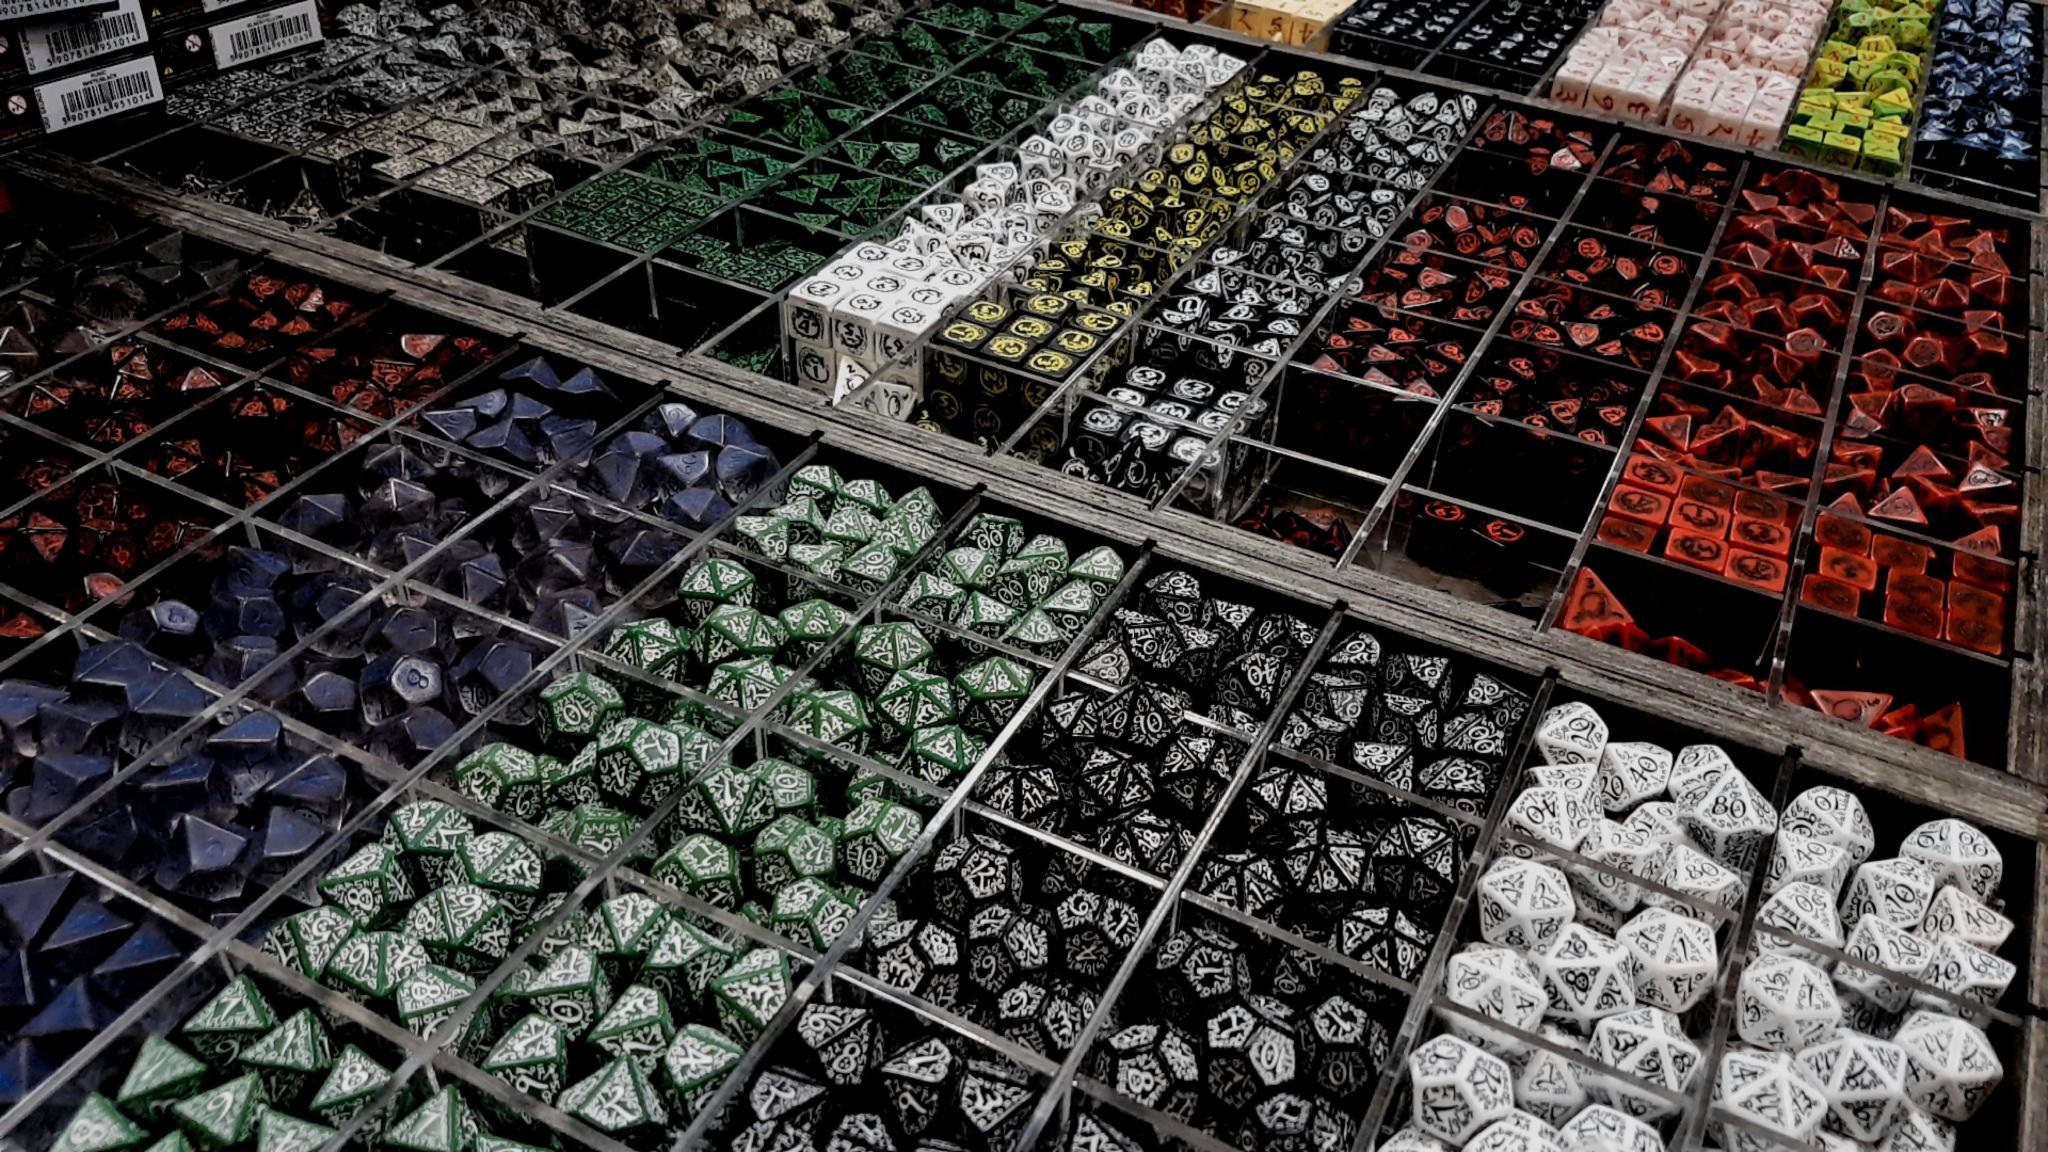 Some random dice